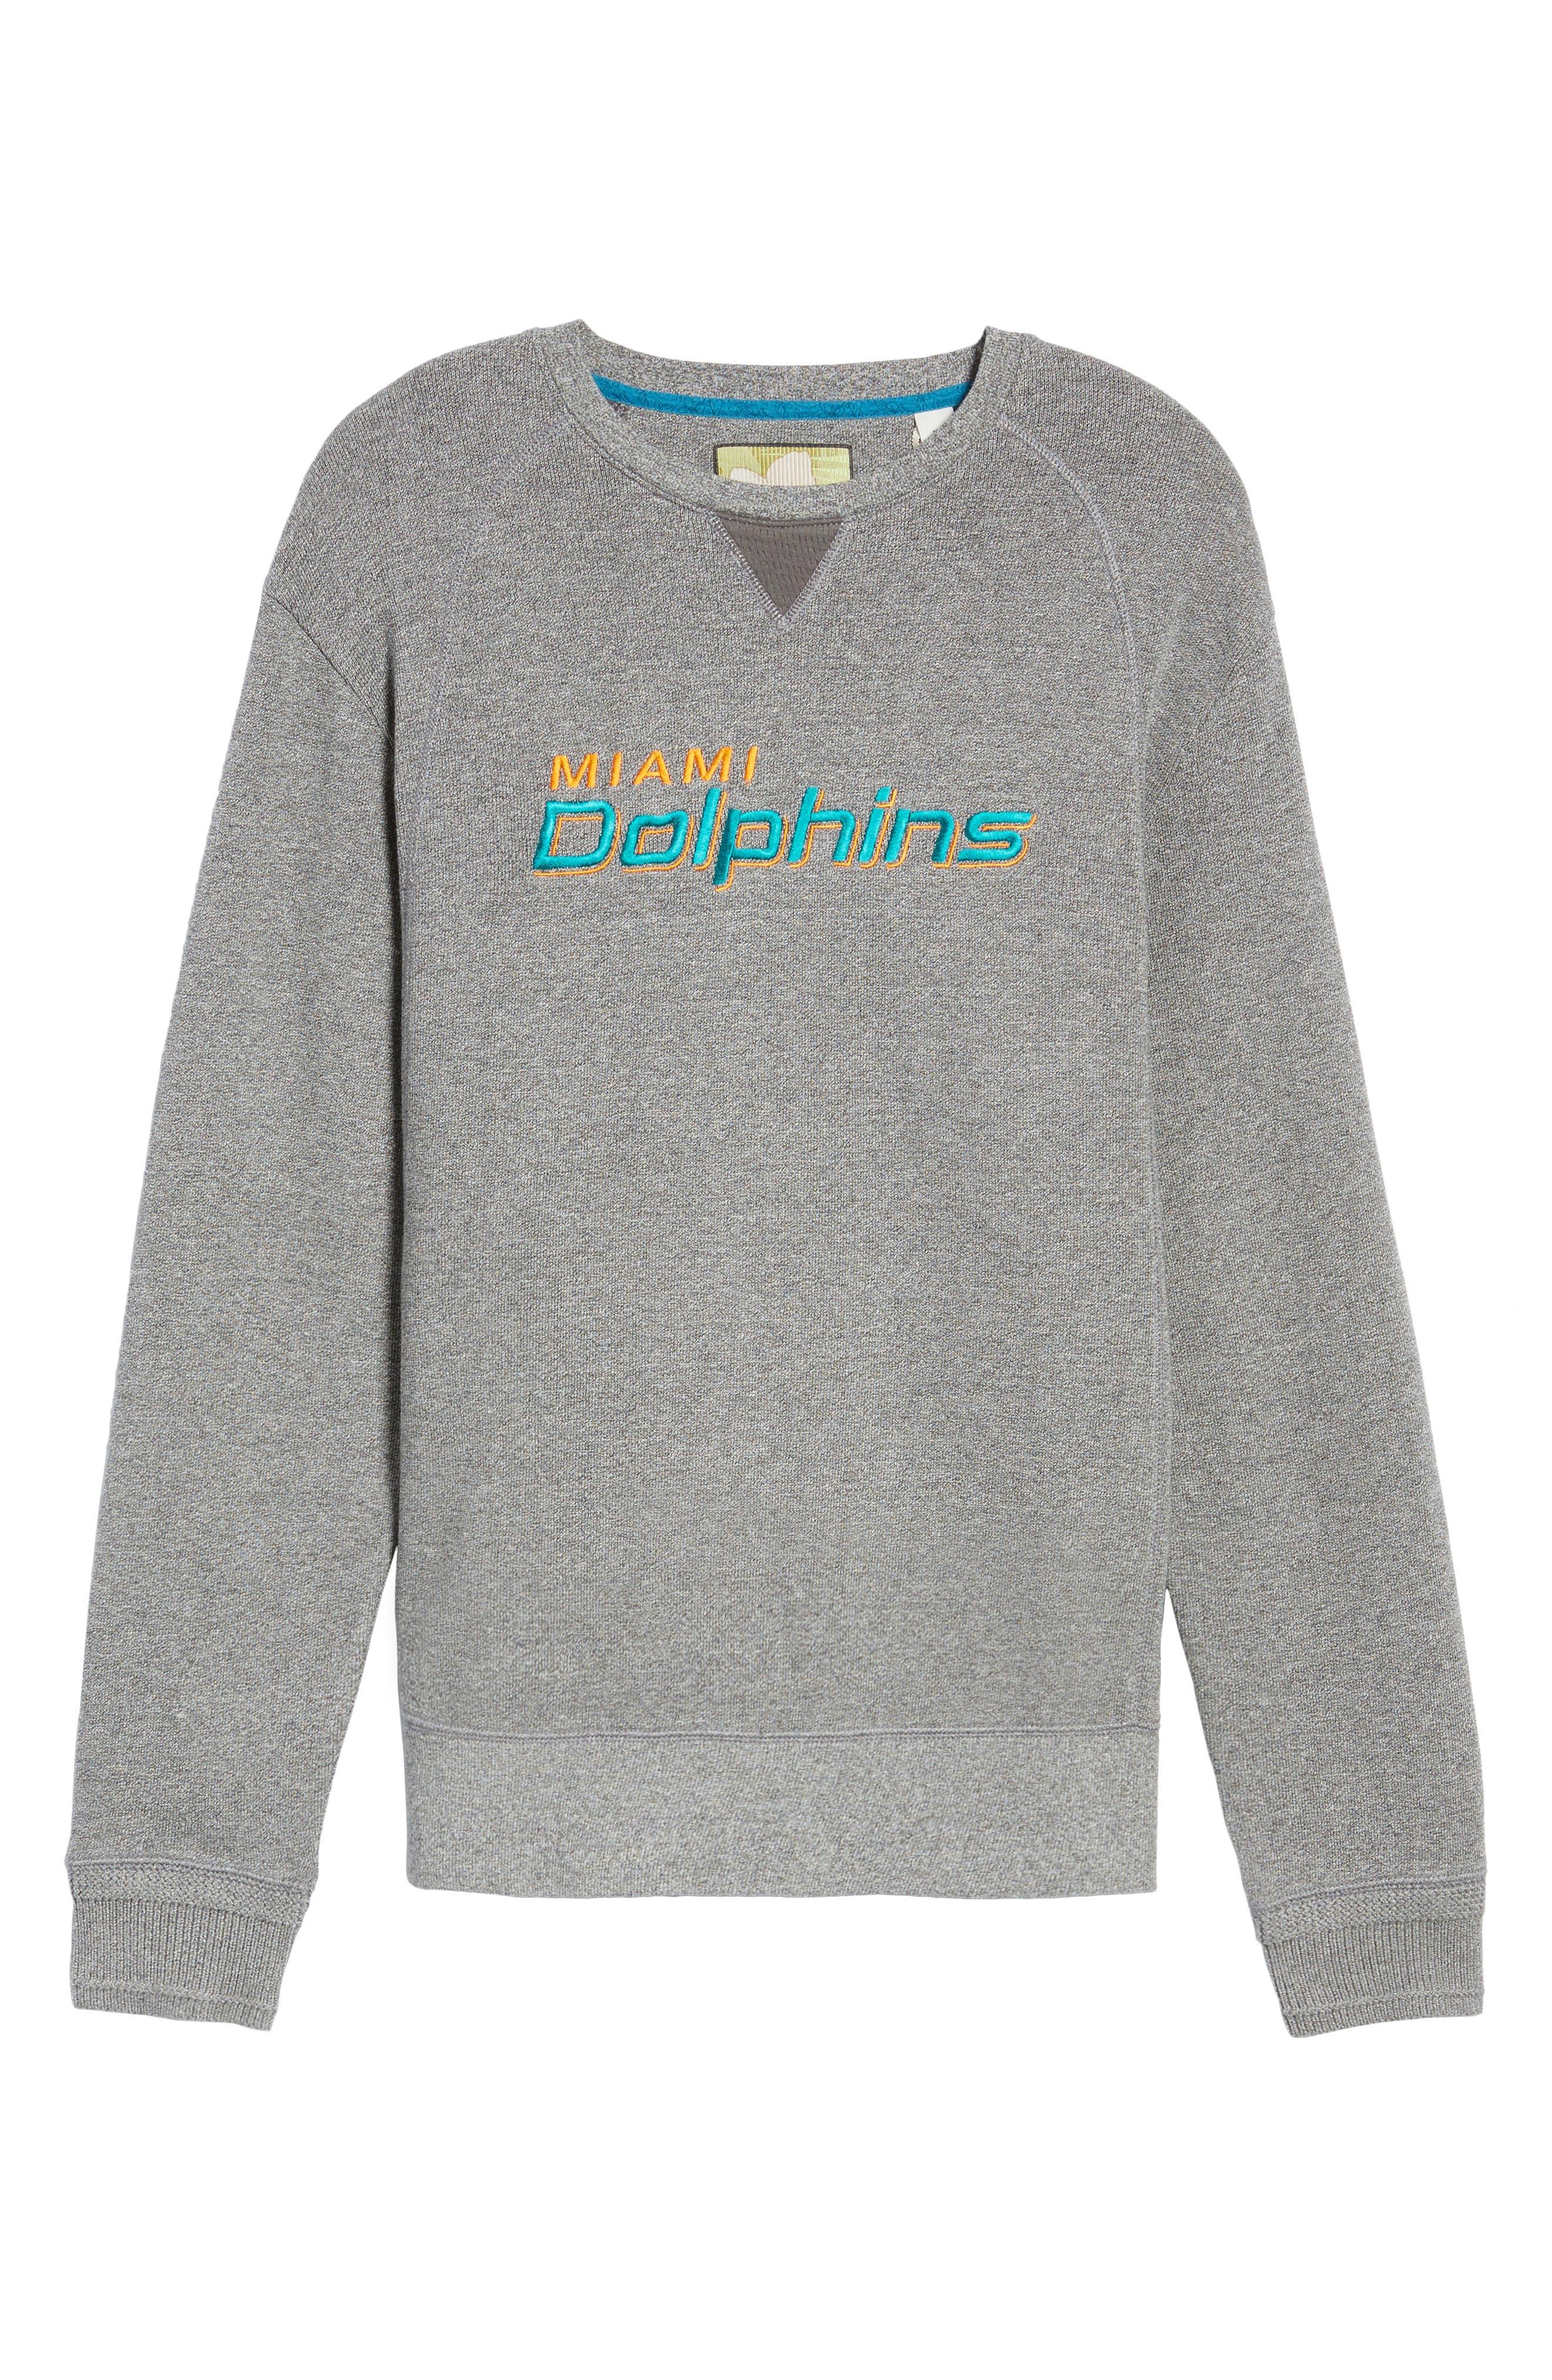 NFL Stitch of Liberty Embroidered Crewneck Sweatshirt,                             Alternate thumbnail 165, color,